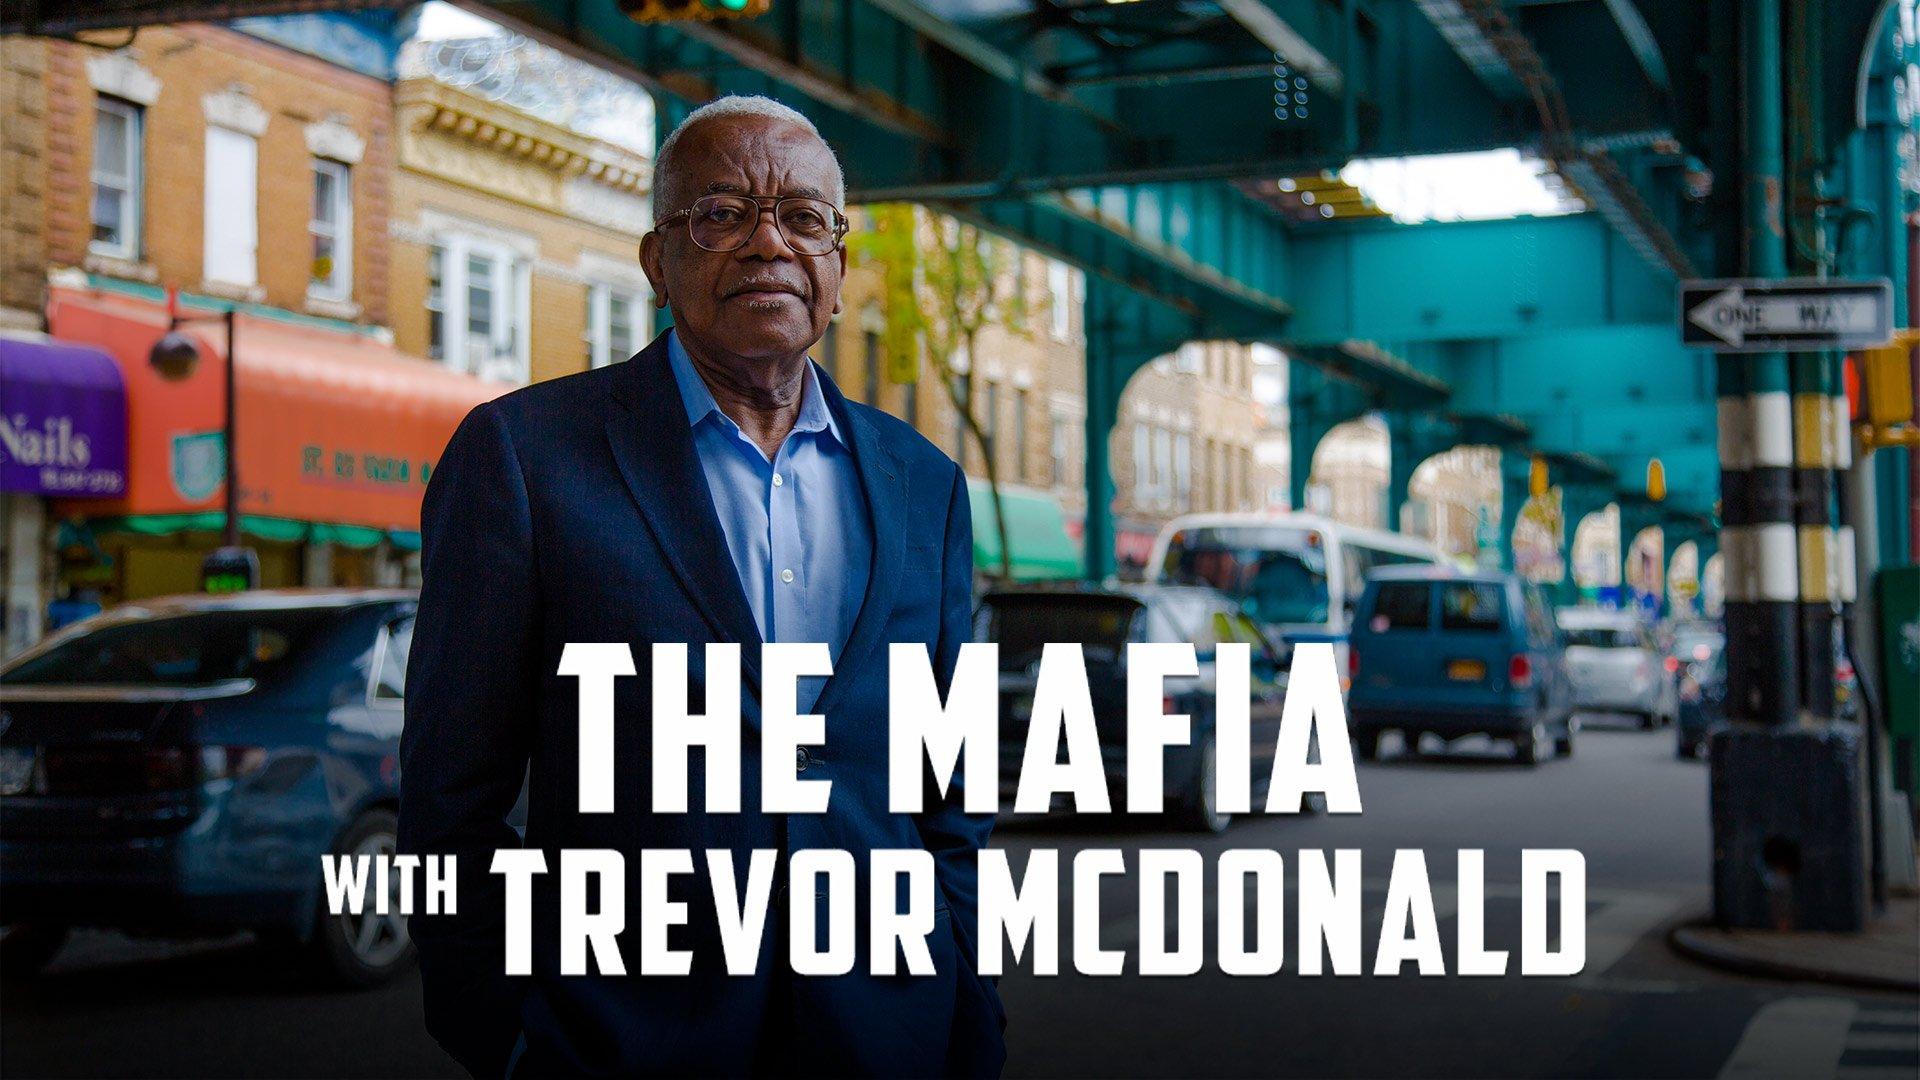 The Mafia with Trevor McDonald on BritBox UK